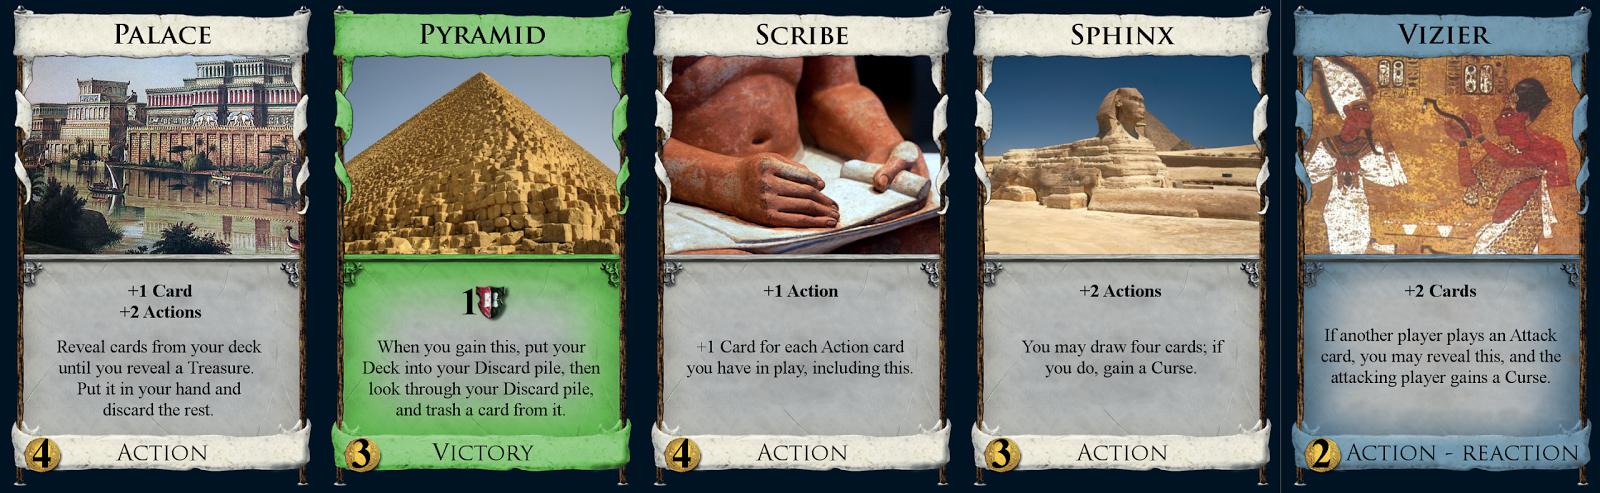 Palace, Pyramid, Scribe, Sphinx, & Vizier